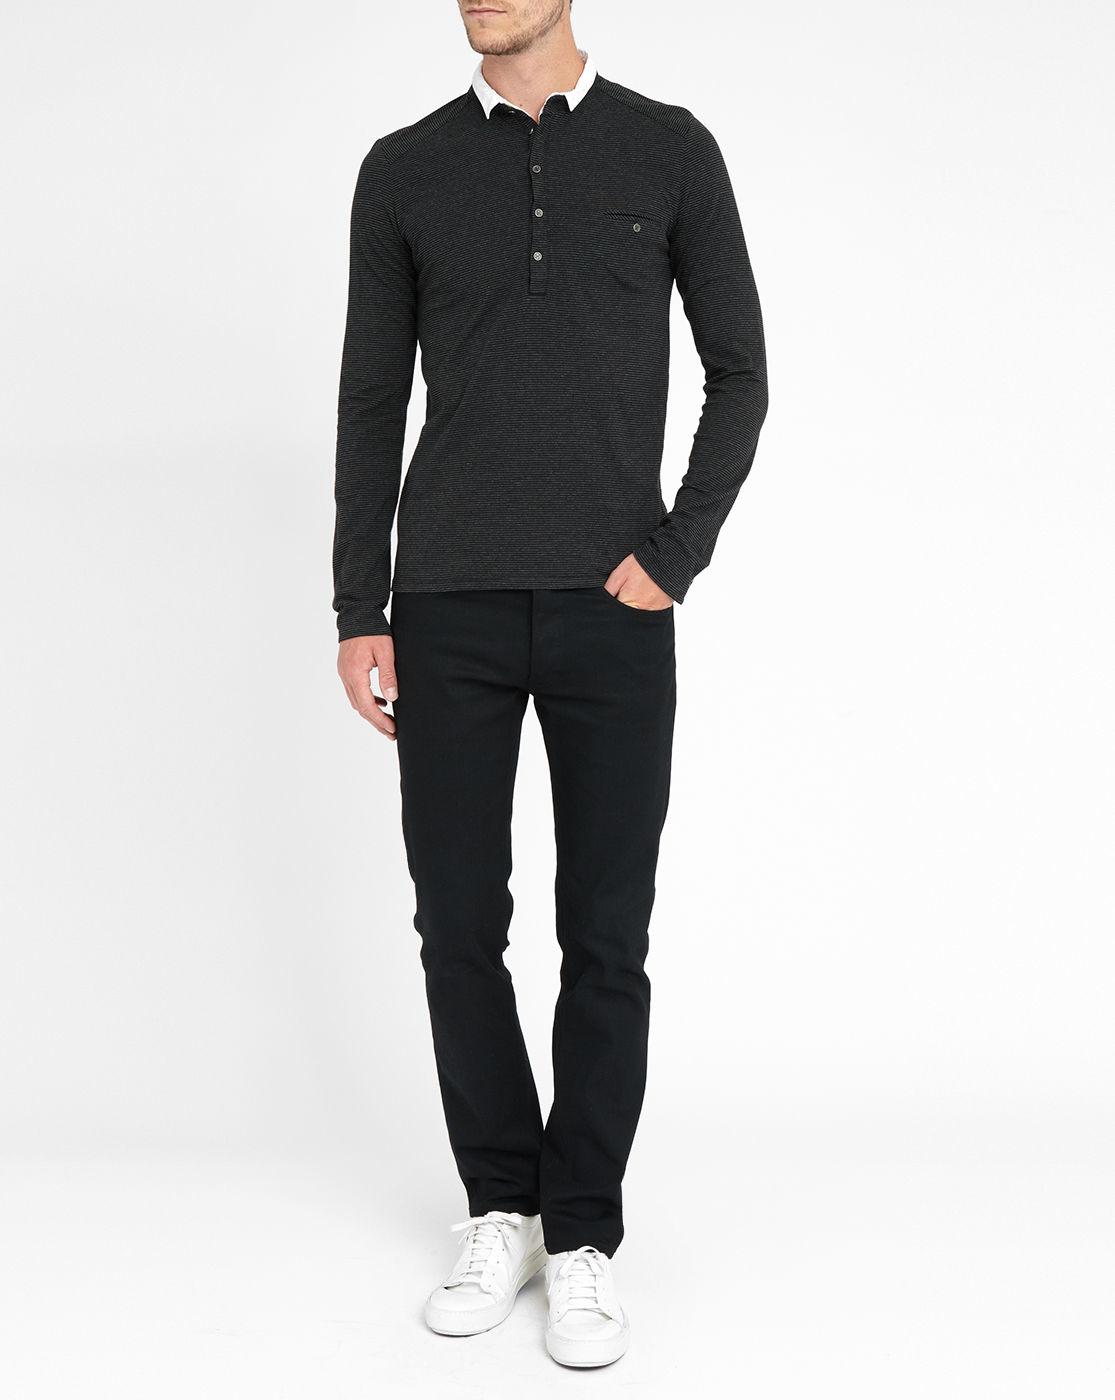 ikks black long sleeve pocket polo shirt with contrasting white collar in black for men lyst. Black Bedroom Furniture Sets. Home Design Ideas